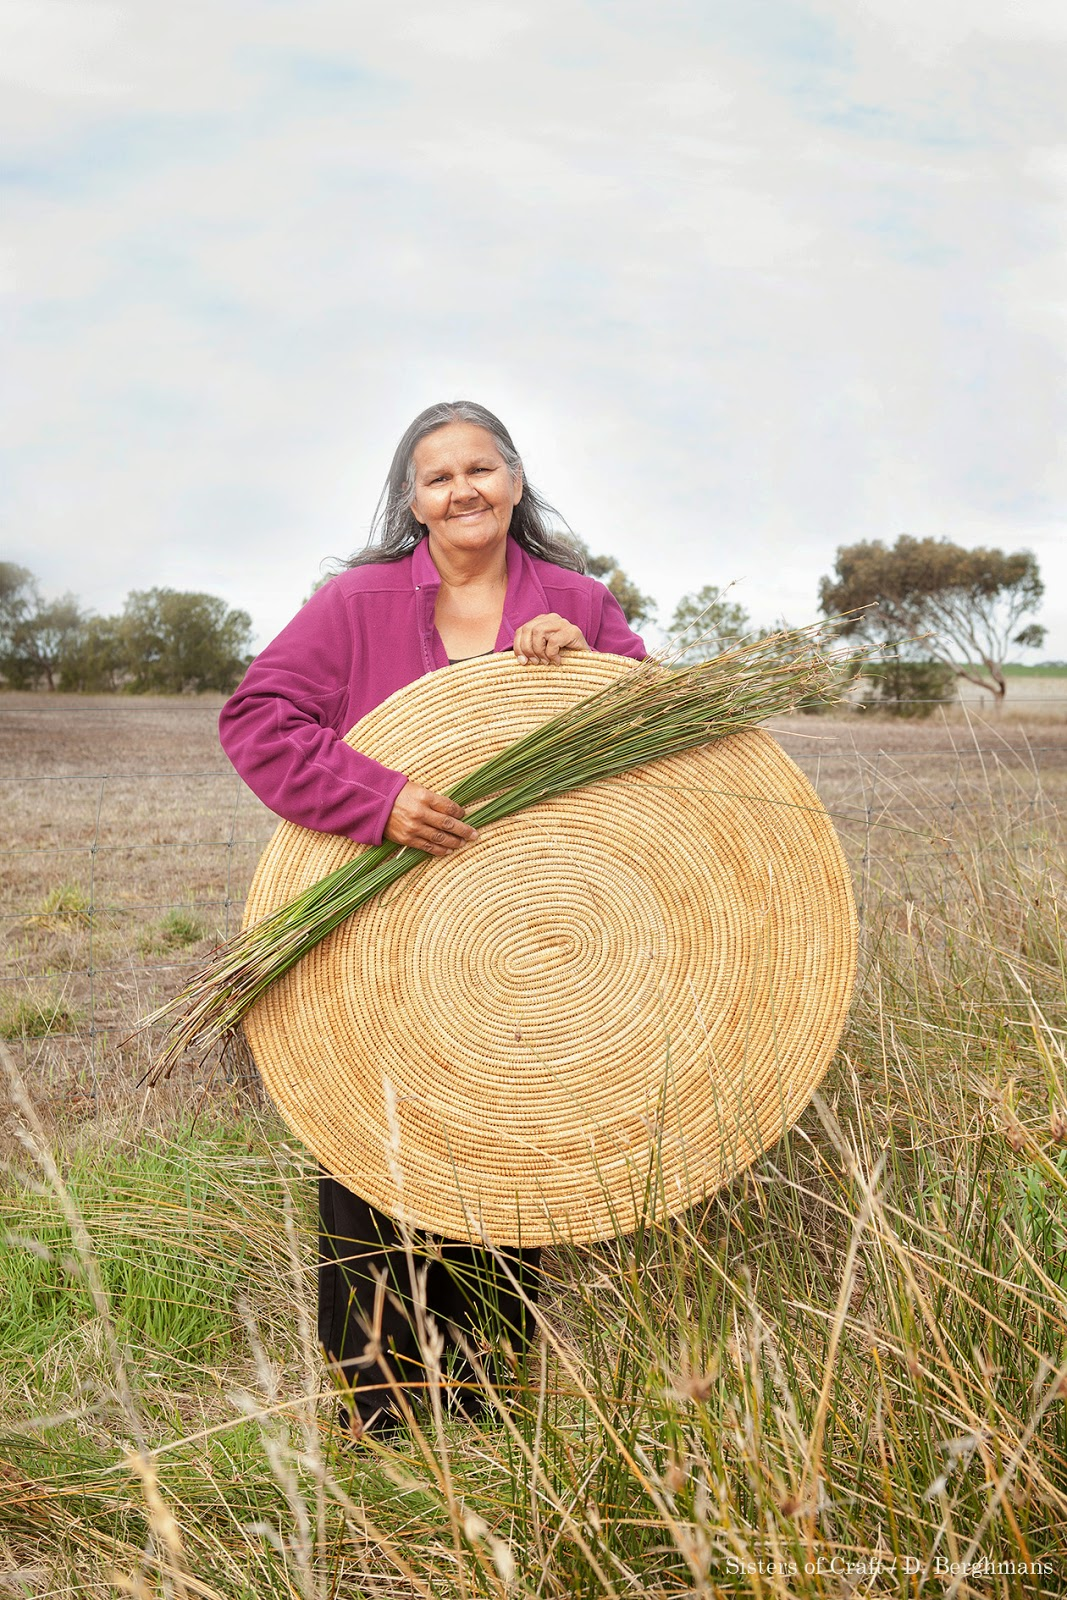 Basket Weaving Aboriginal : Sisters of craft ngarrindjeri weaving lives